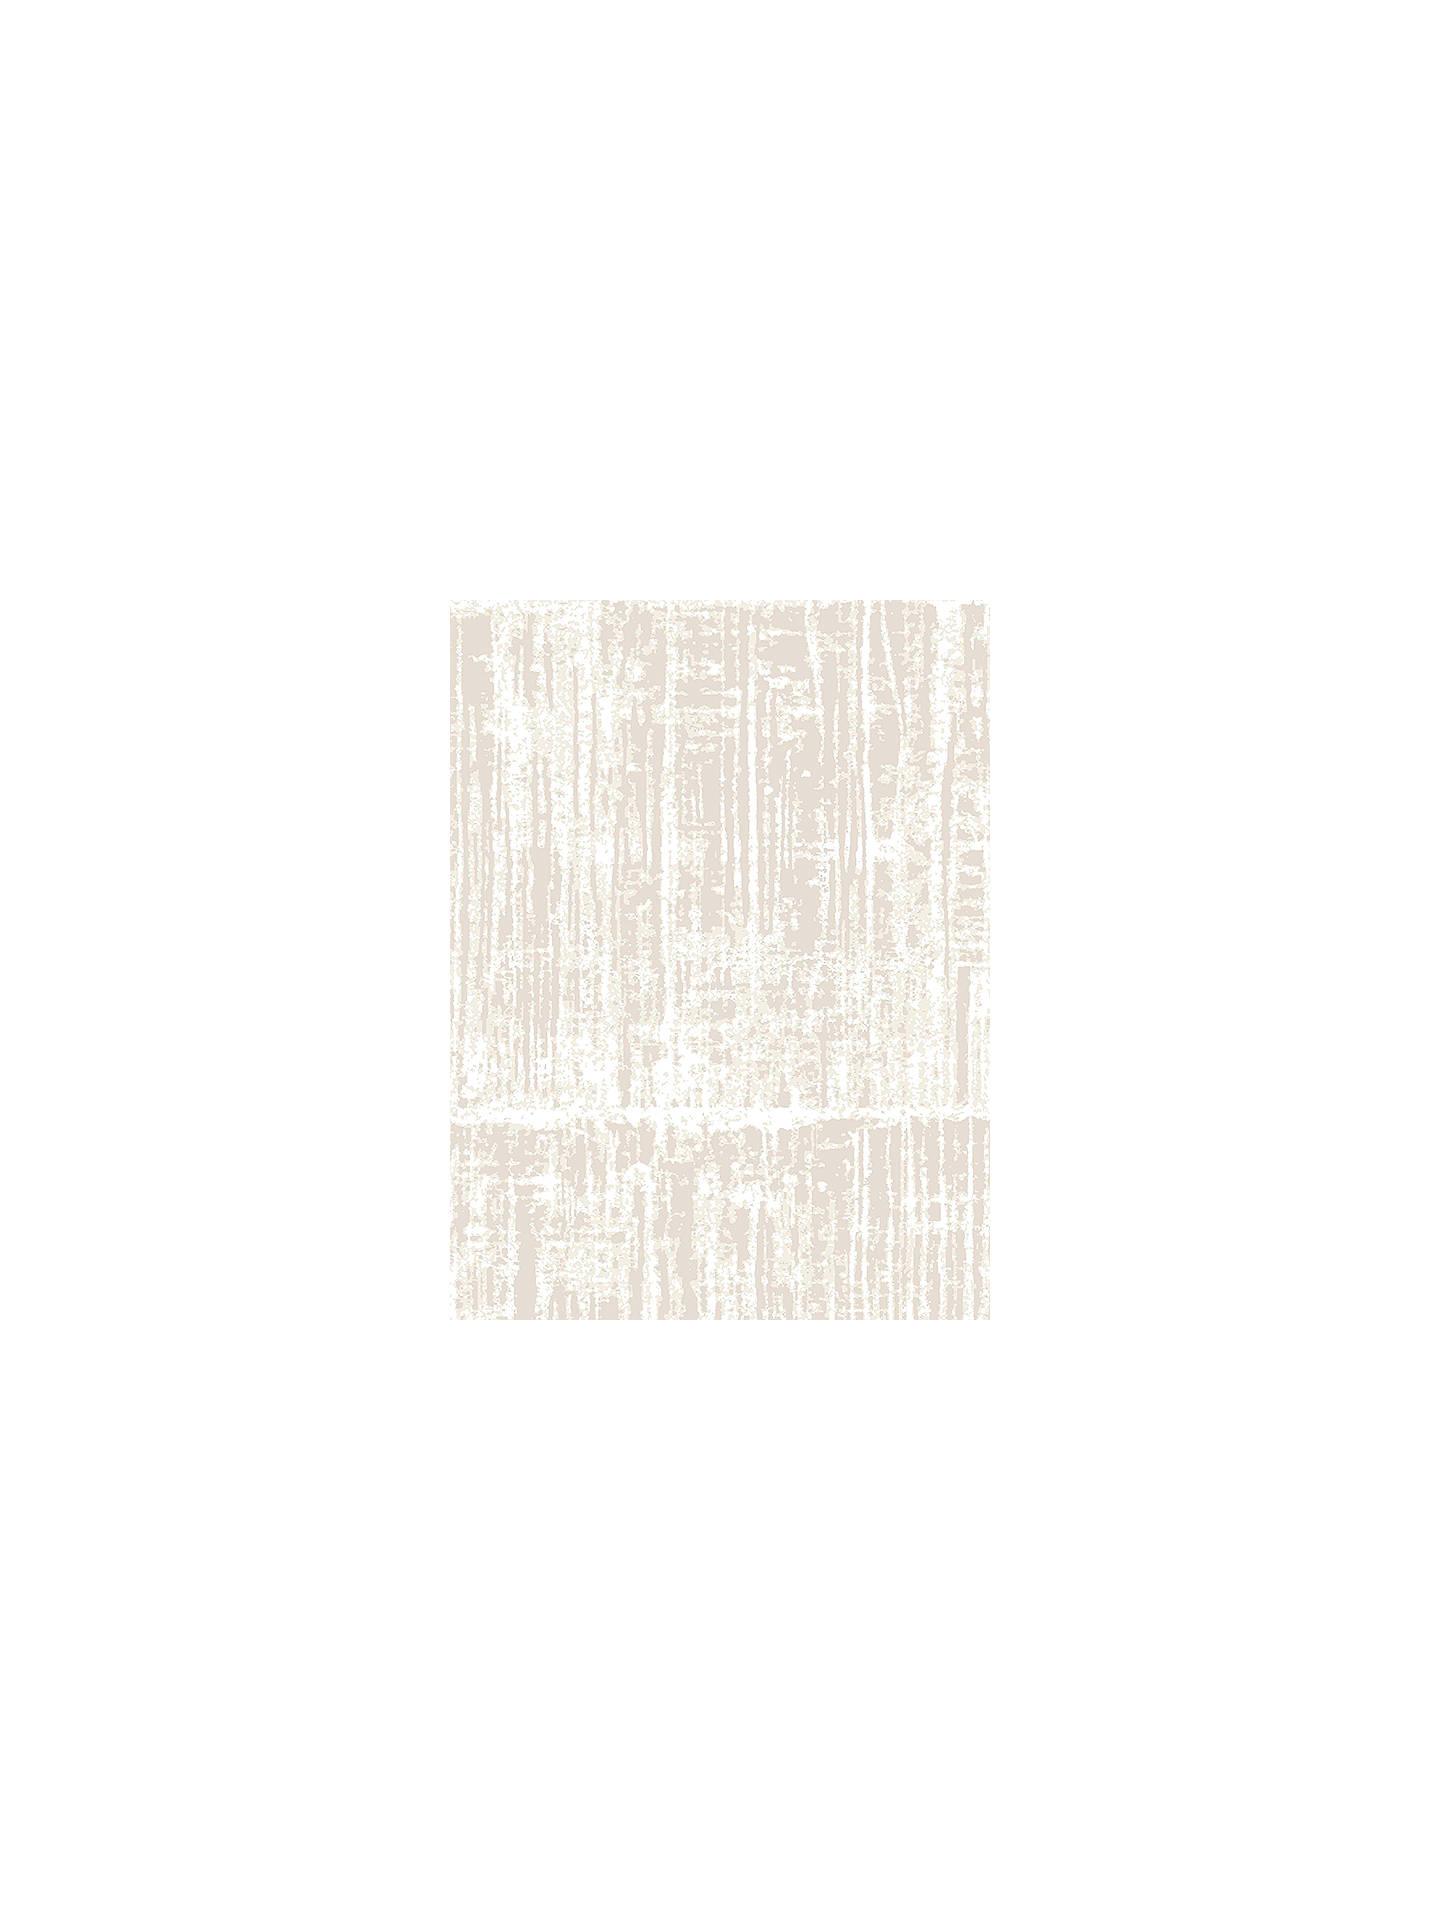 Vertical Thread Texture Lined Beige Wallpaper R4173 | Home ... | 1920x1440